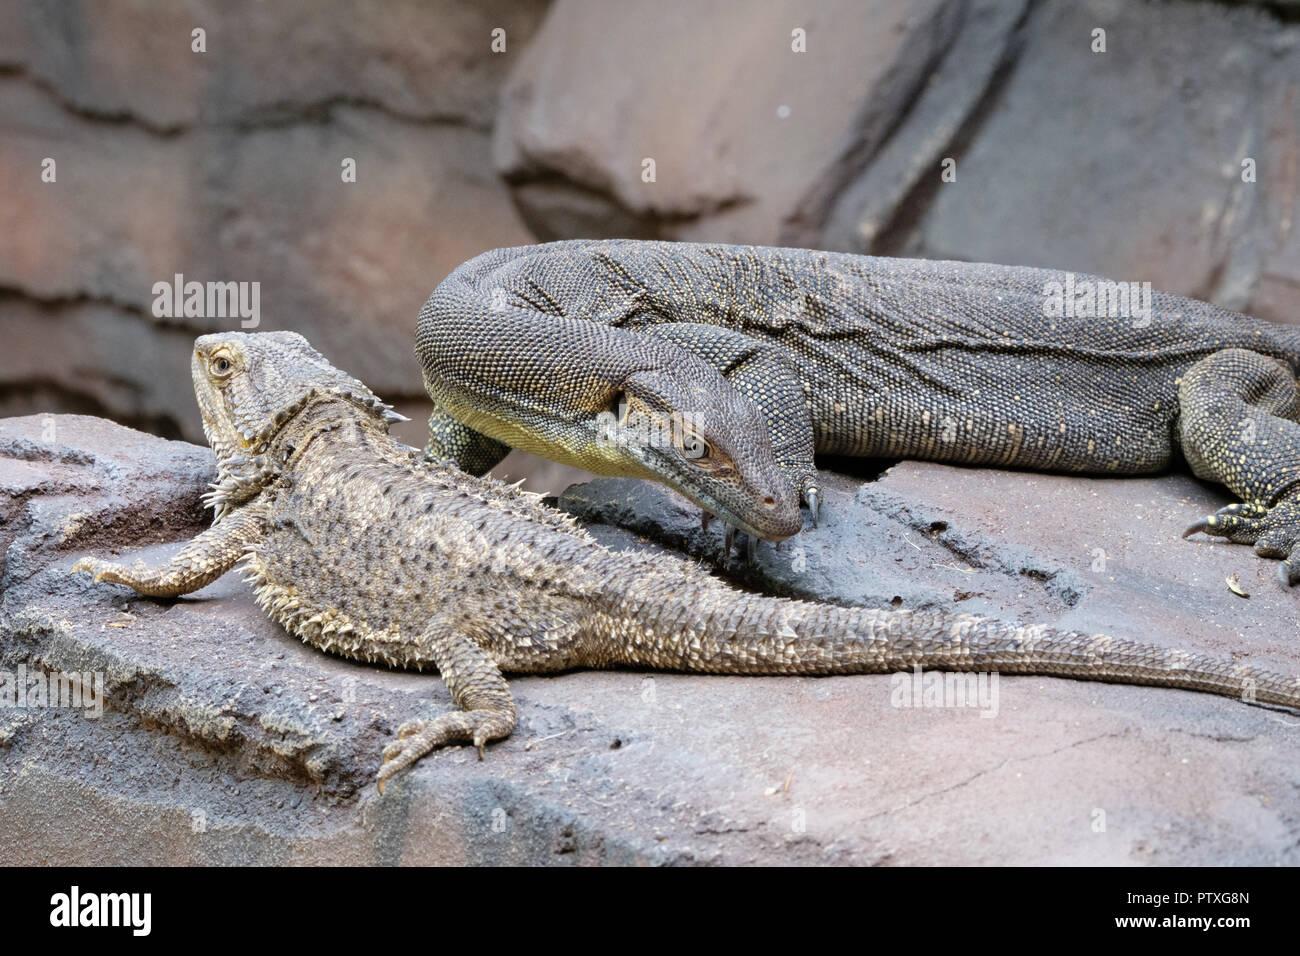 9d5566754cf63c Reptiles at Australia Zoo Stock Photo  221859701 - Alamy